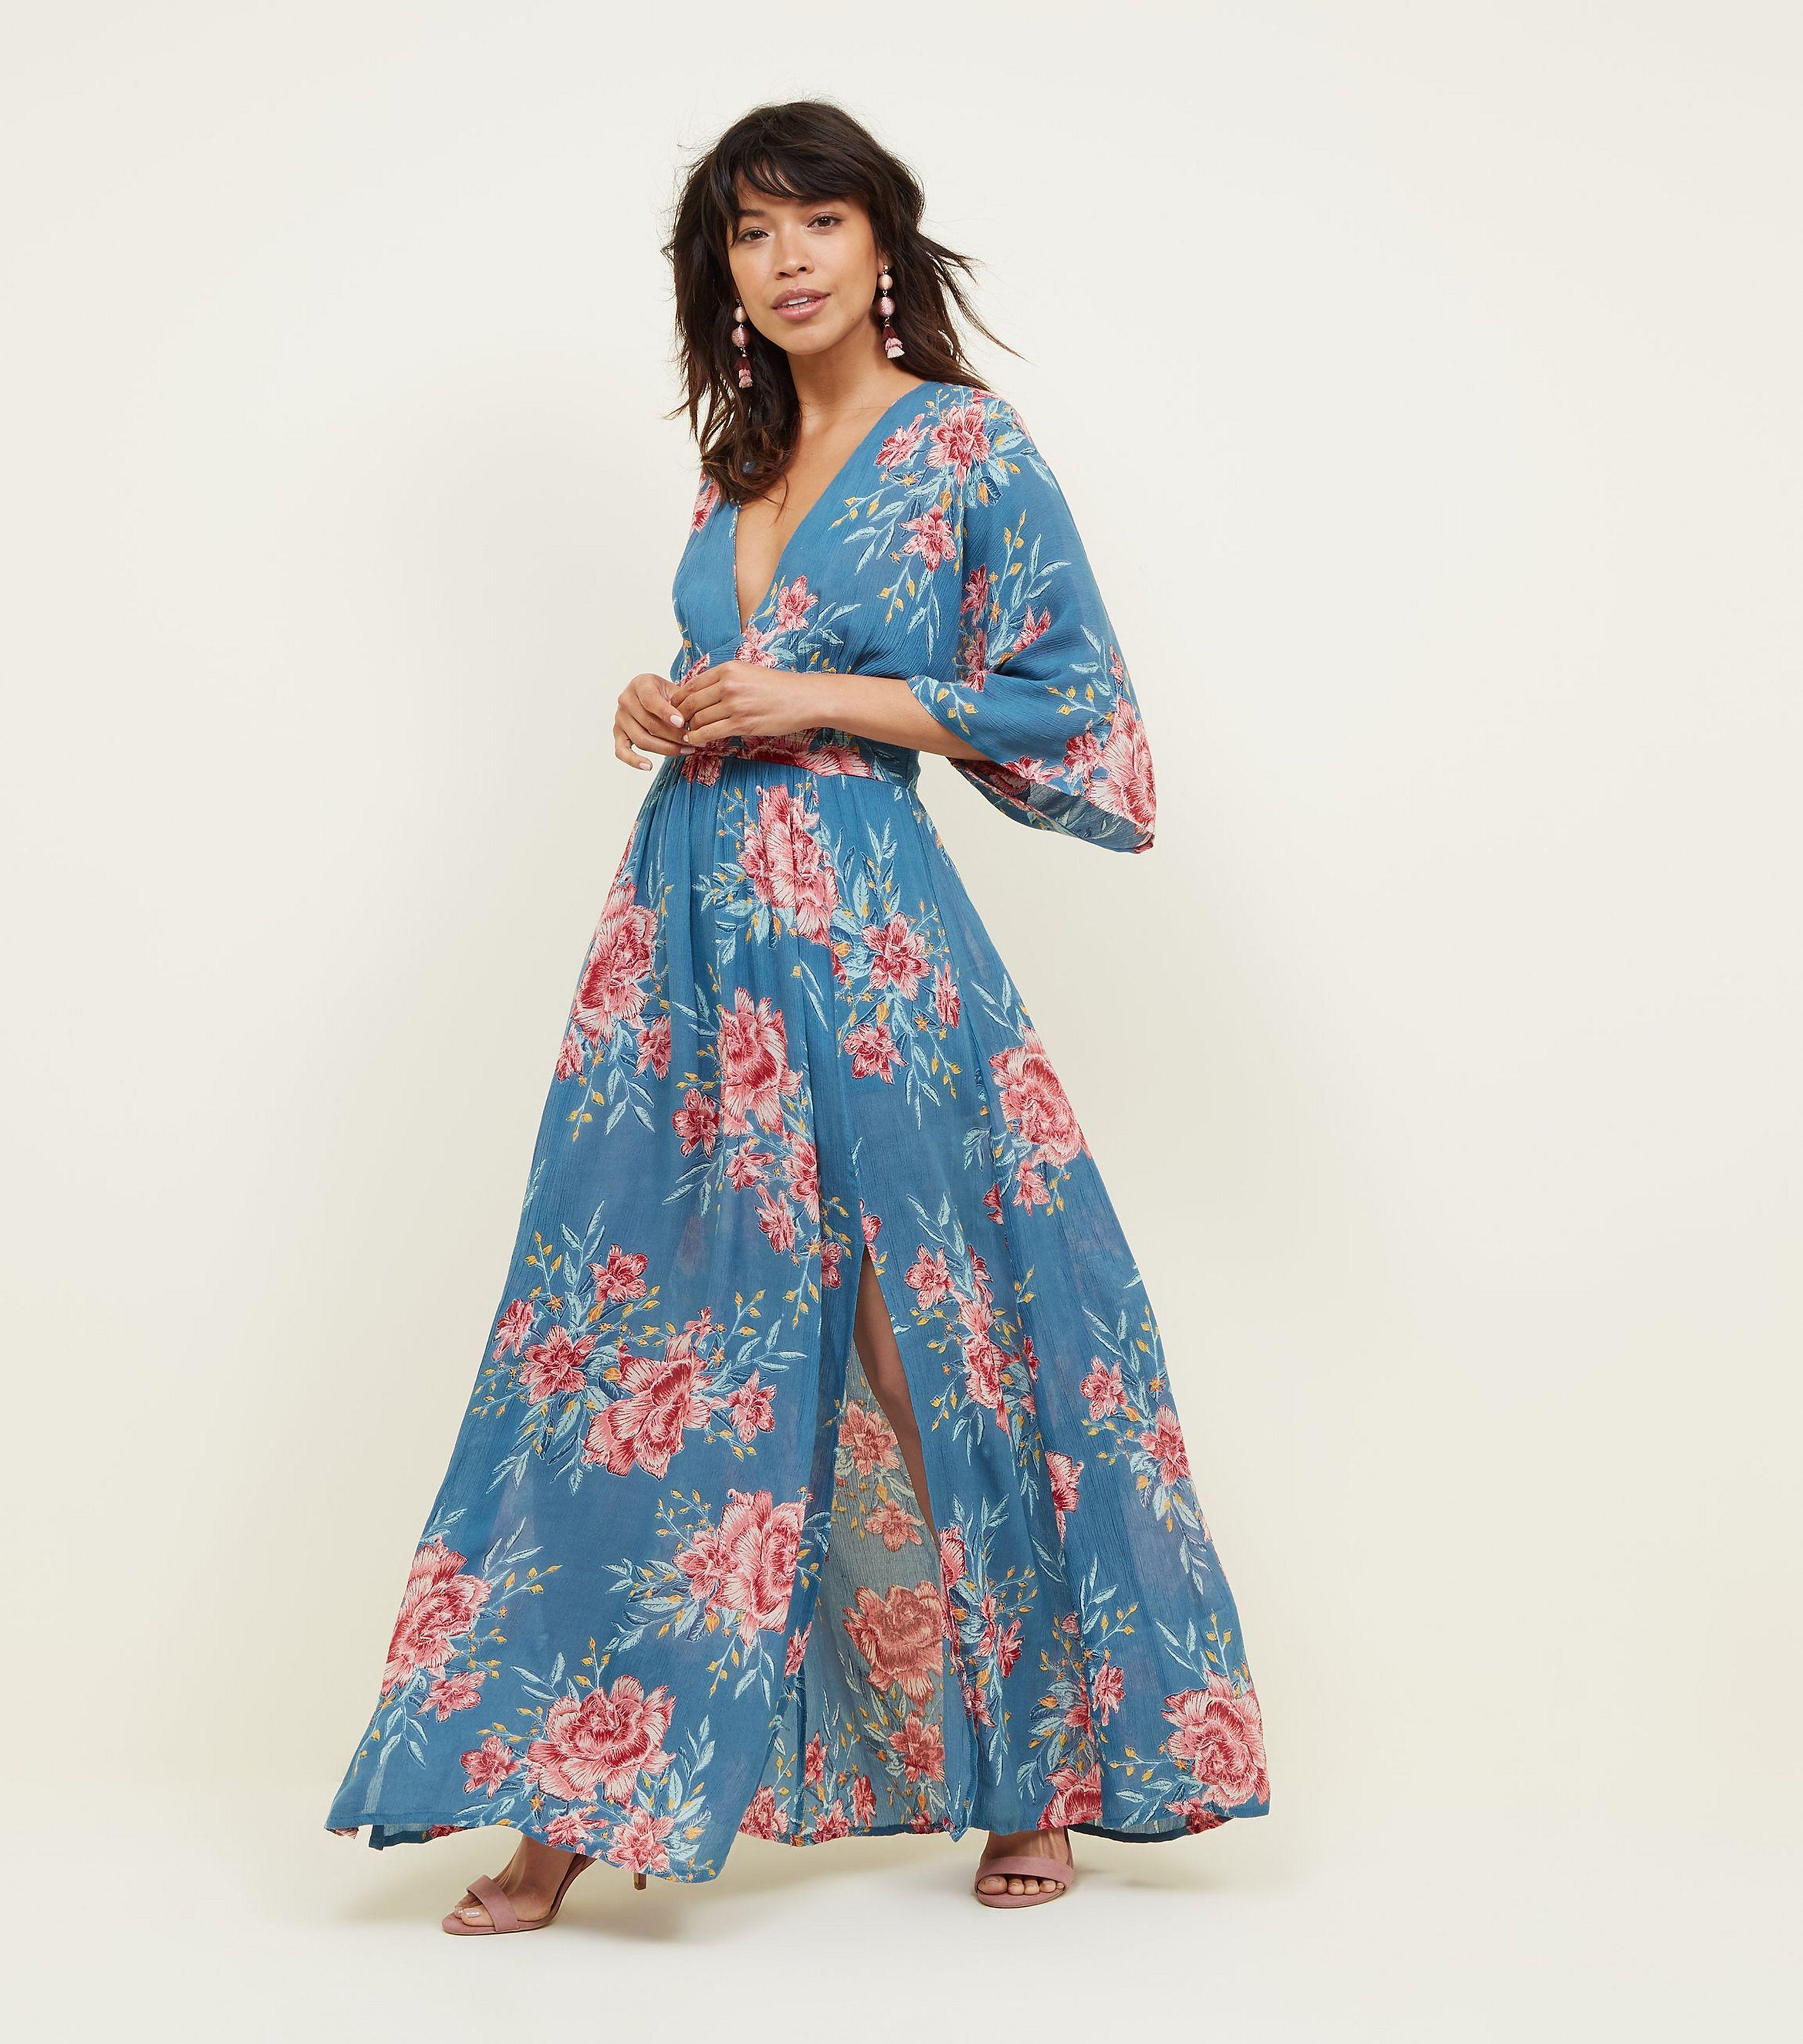 d573c0d24 New Look Blue Floral Kimono Sleeve Maxi Dress in Blue - Lyst